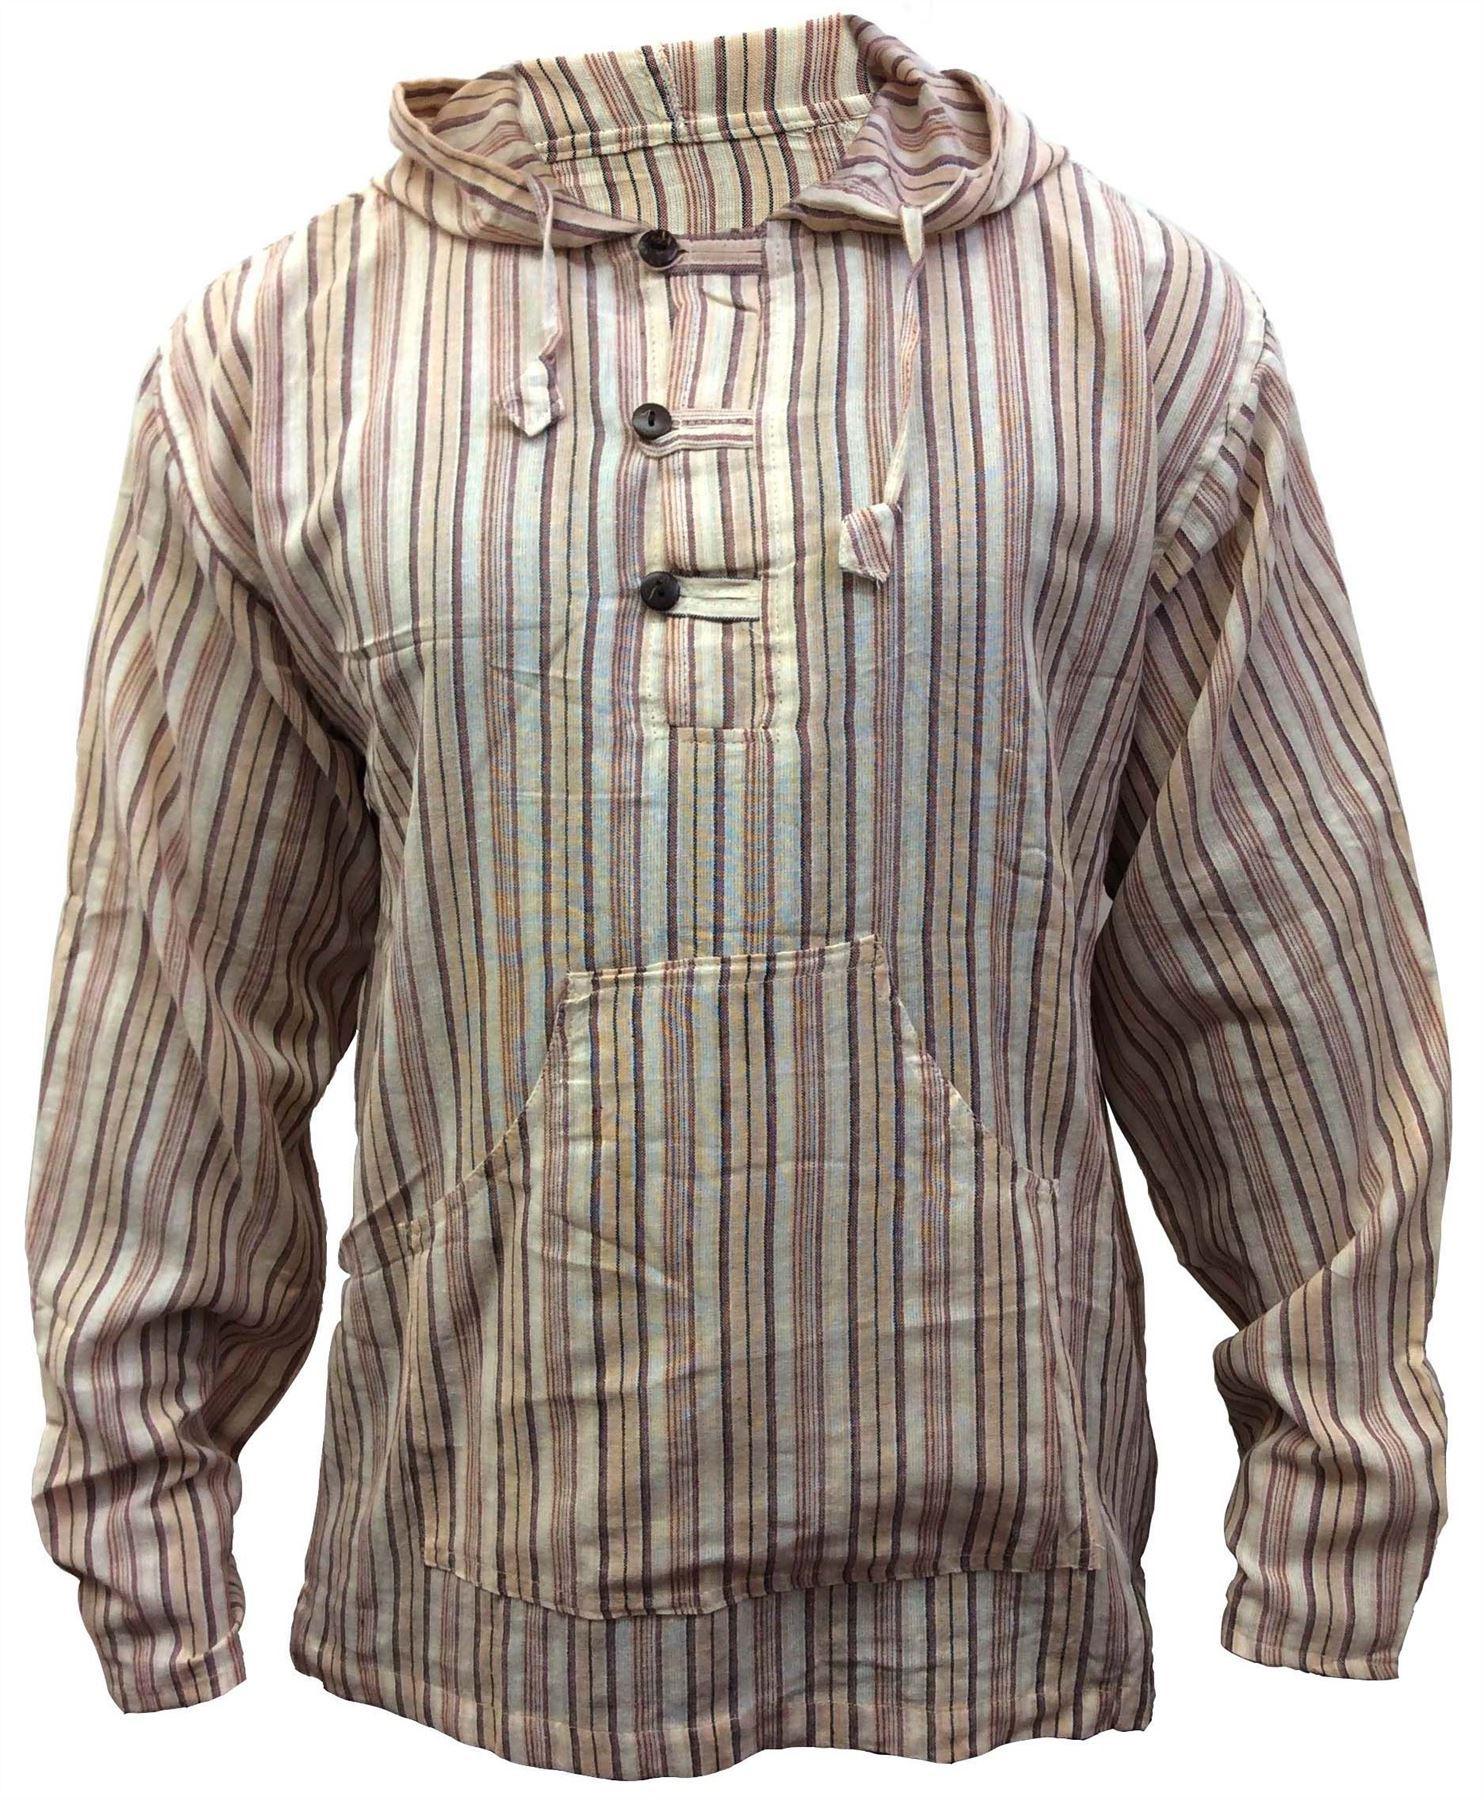 Men-039-s-Cotton-Grandad-Shirt-Full-Sleeved-Hippie-Top-Festival-Stripe-Hippy-Hoodie thumbnail 15